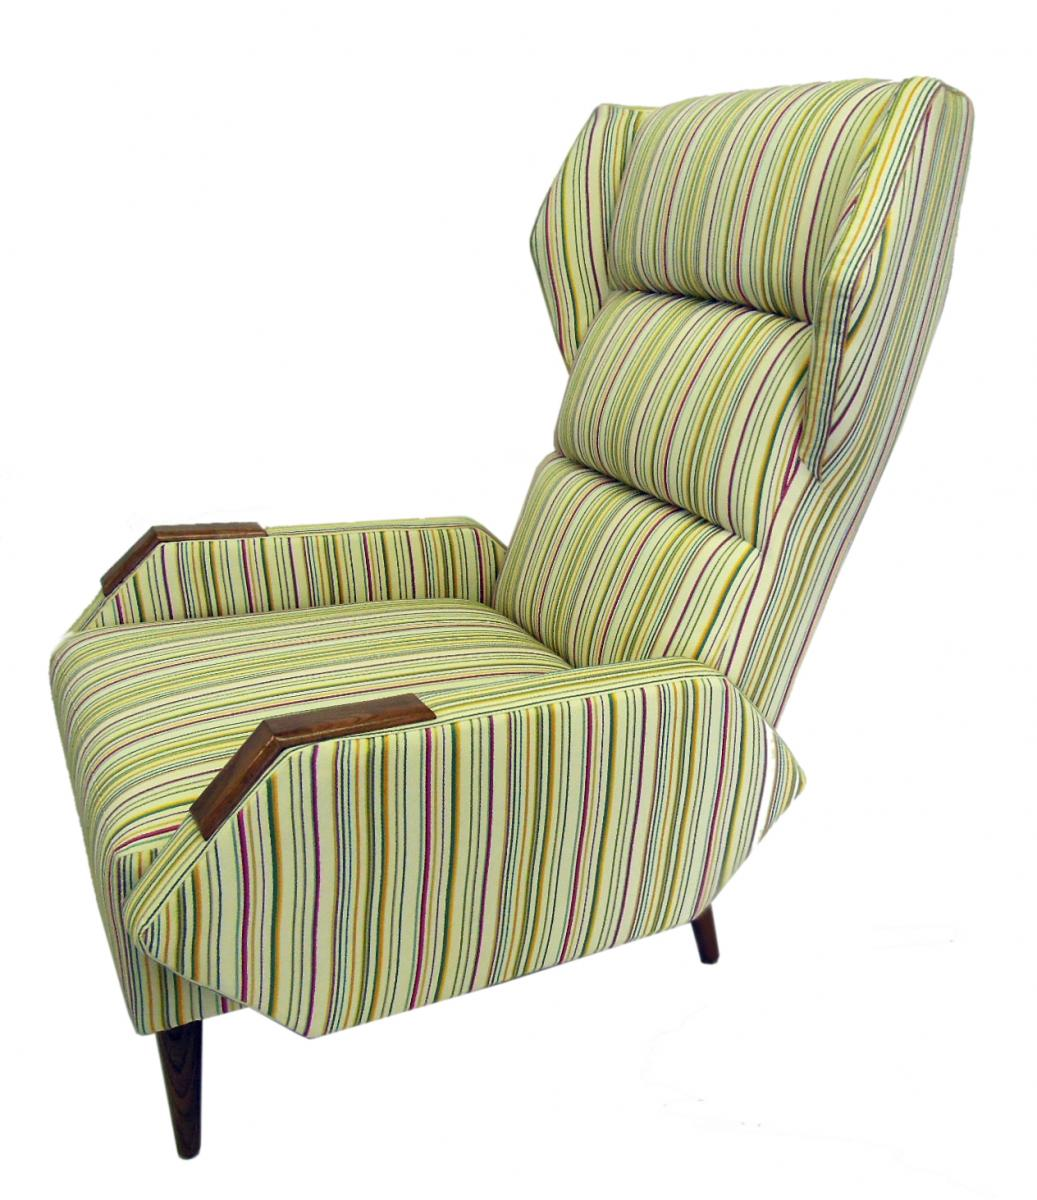 MOD Jonathan Adler Chair Reupholster